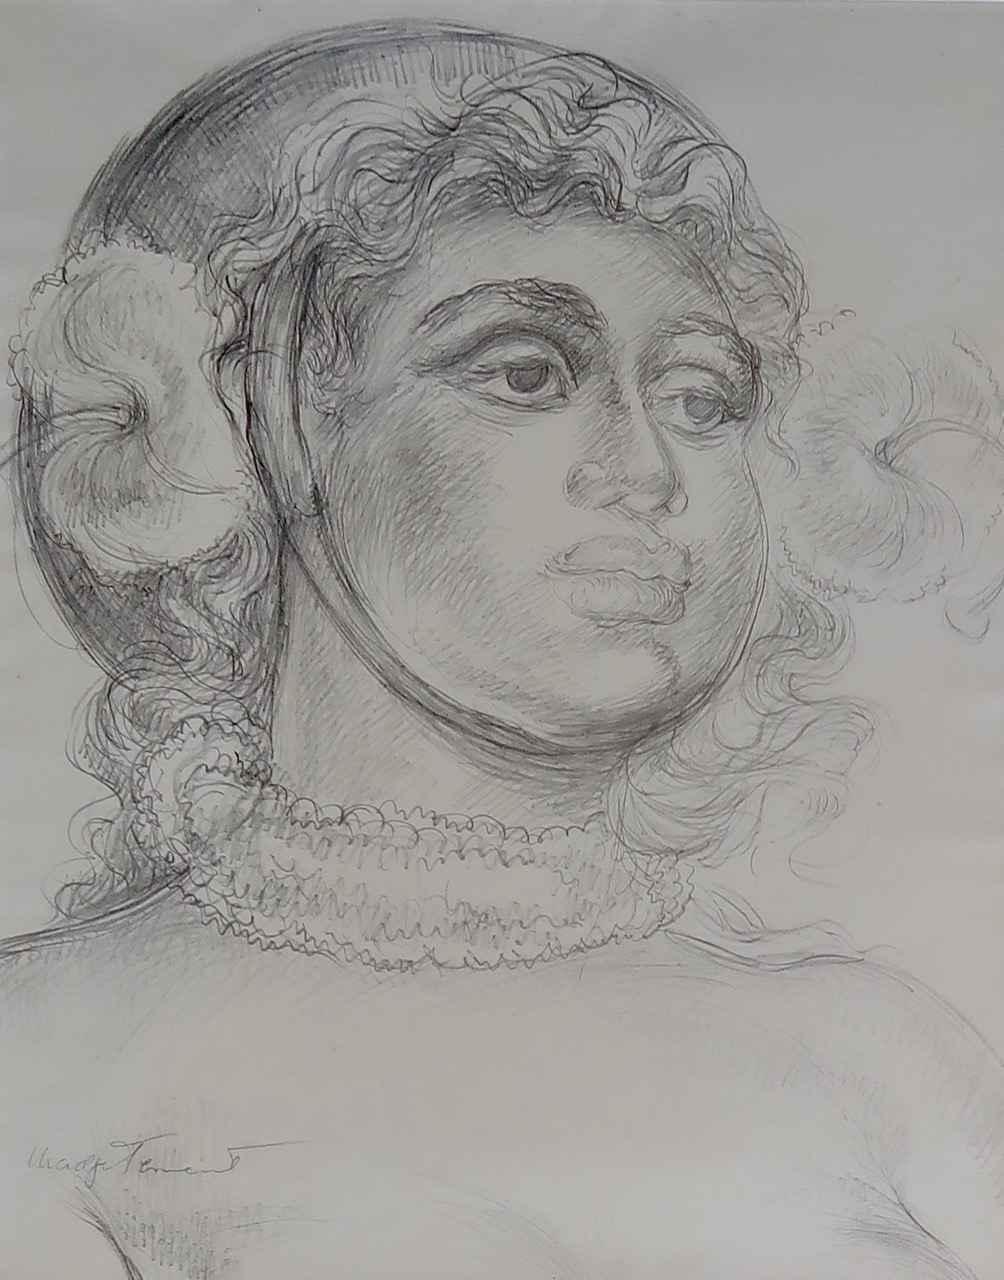 Hawaiian Woman in War... by  Madge Tennent (1889-1972) - Masterpiece Online